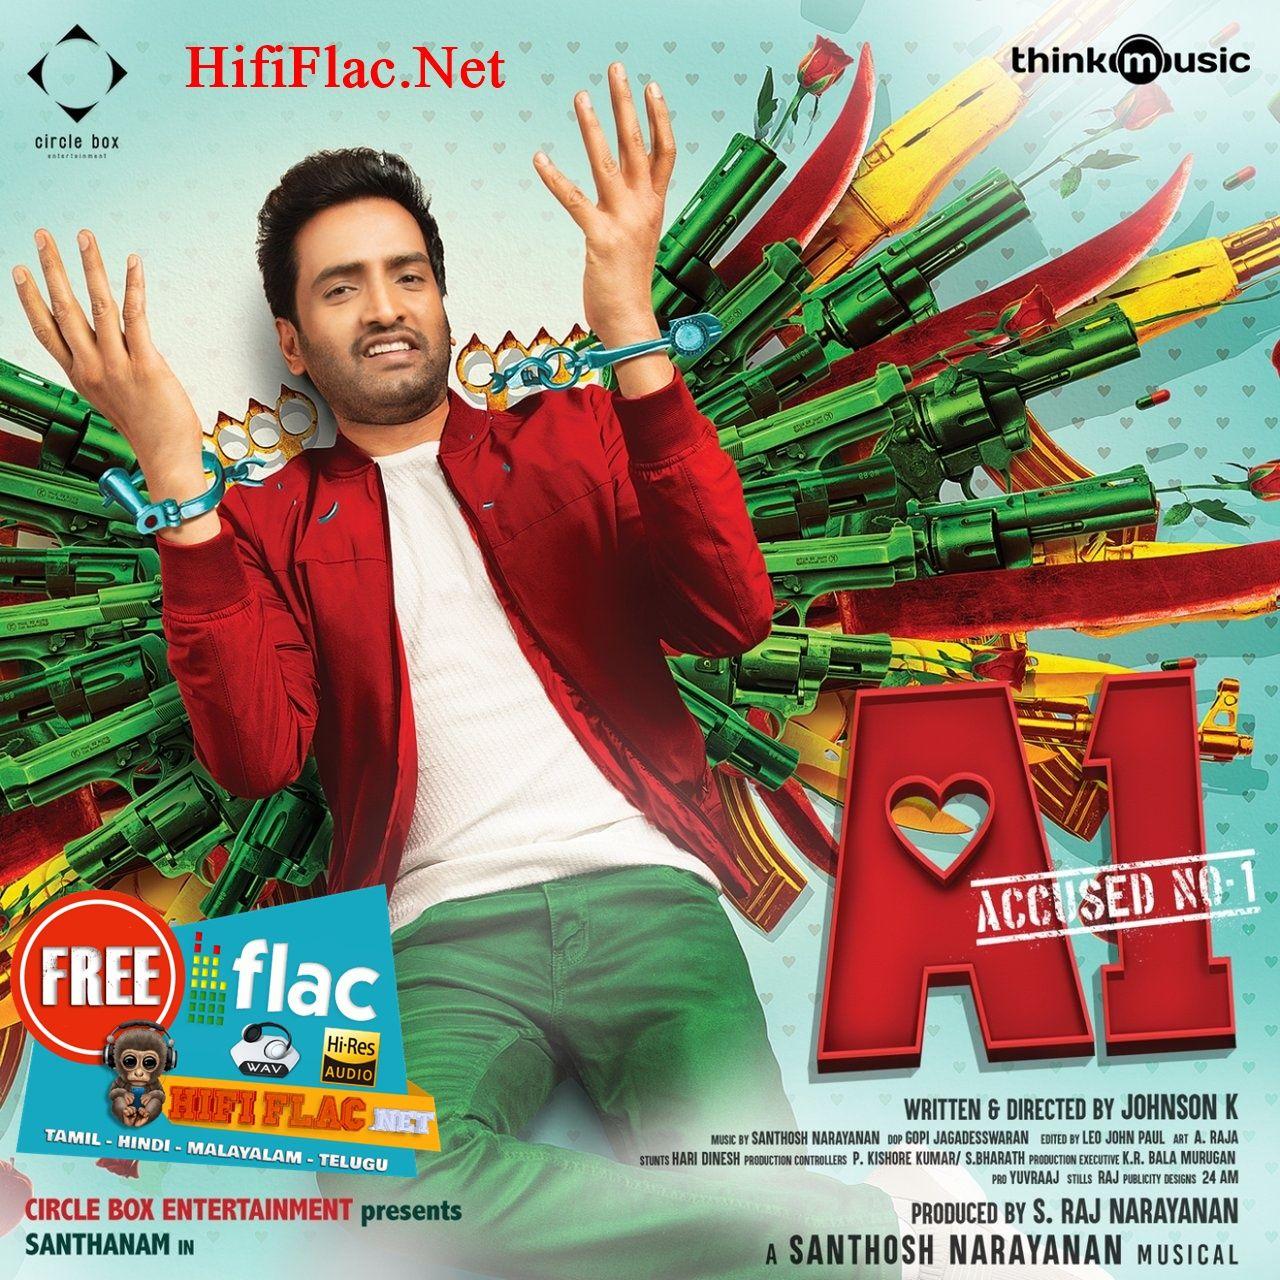 A1 (2019)TamilDIGITALRipFLAC